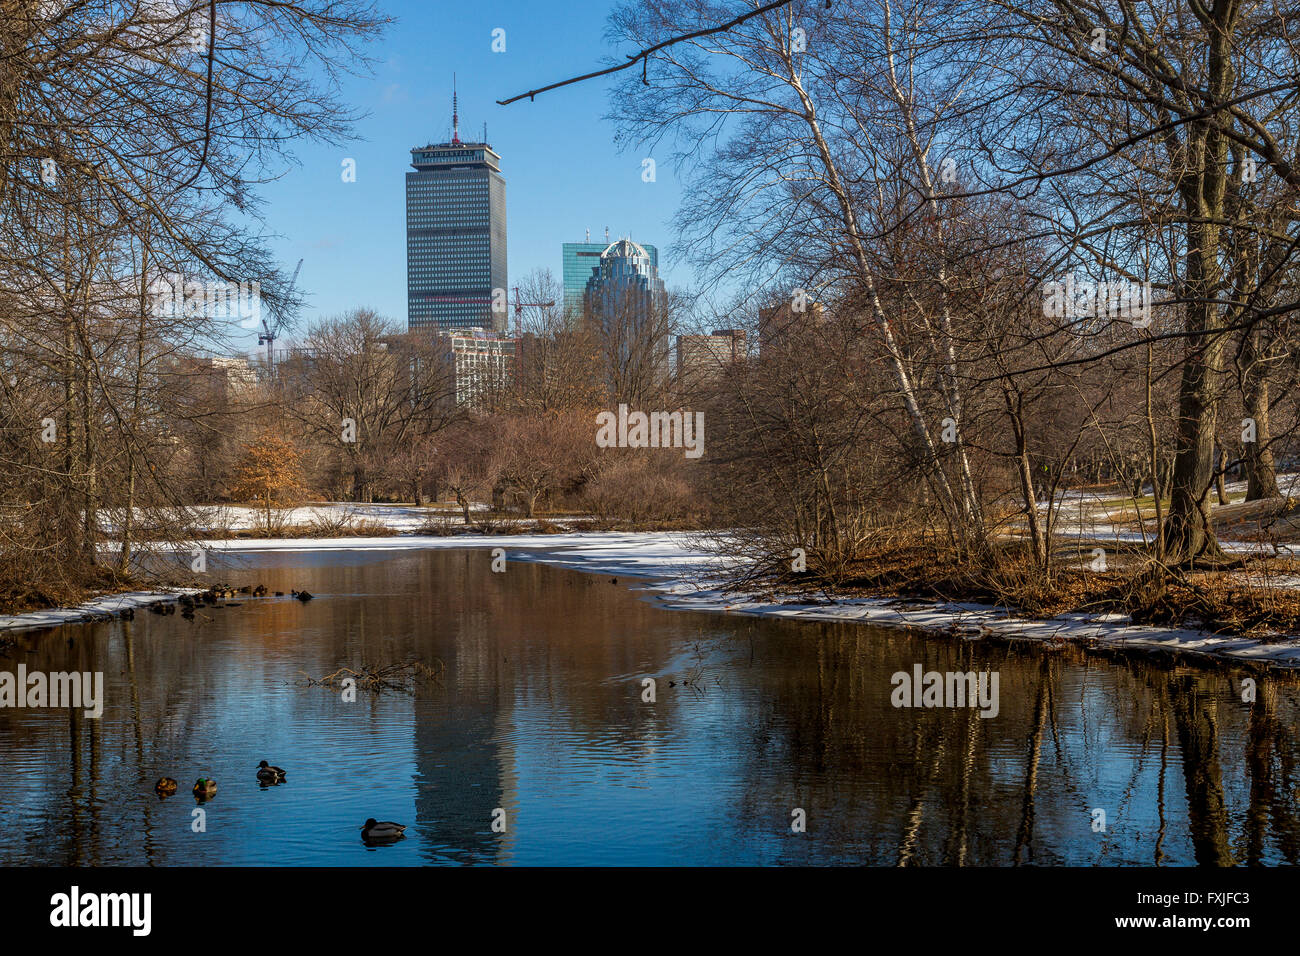 Prudential Tower de Back Bay Fens ,Boston Imagen De Stock